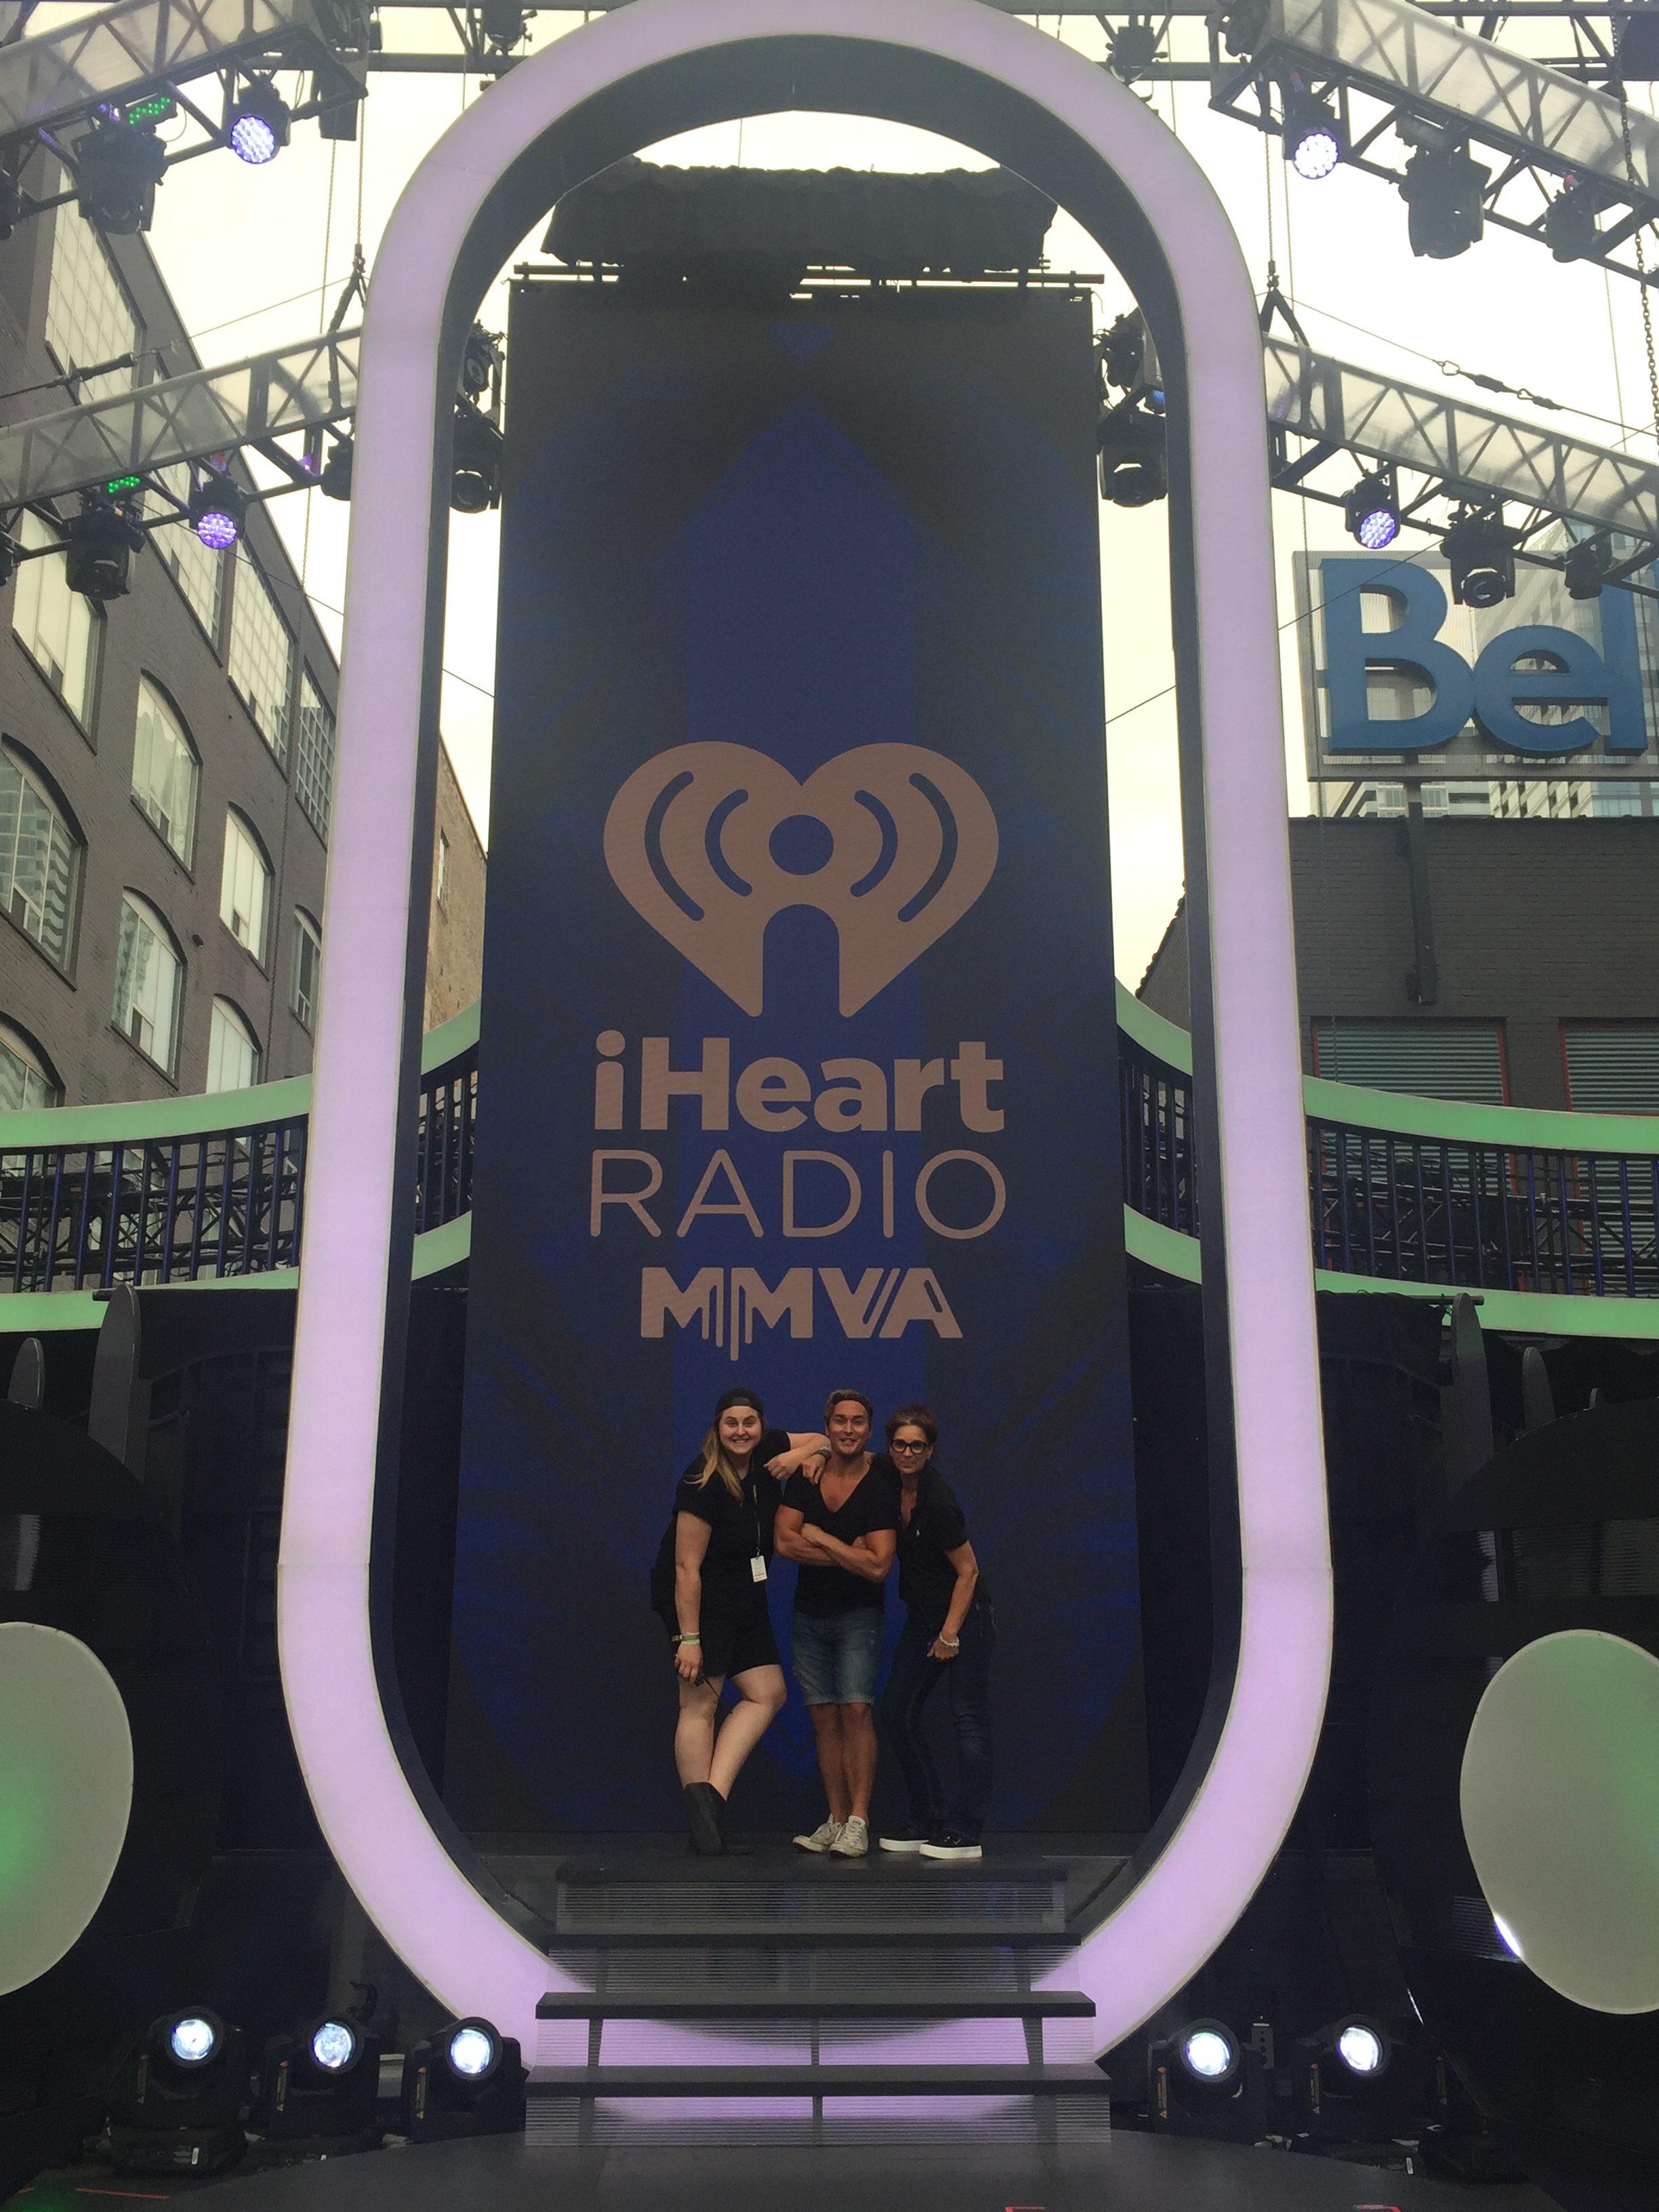 WHAT'S MY JOB: 2018 IHEARTRADIO MMVAS – Bell Media